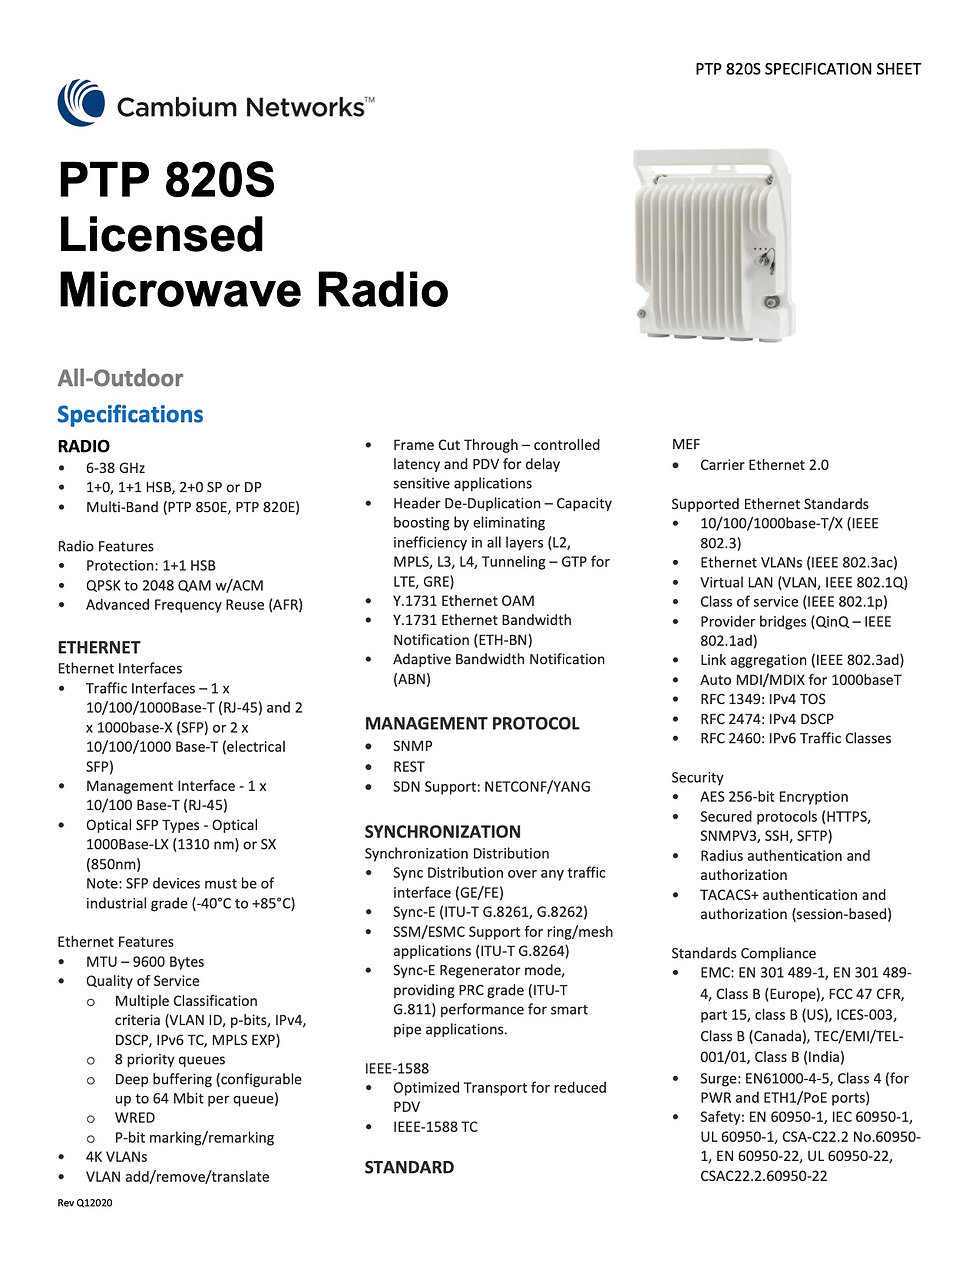 Cambium PTP 820SSpecification